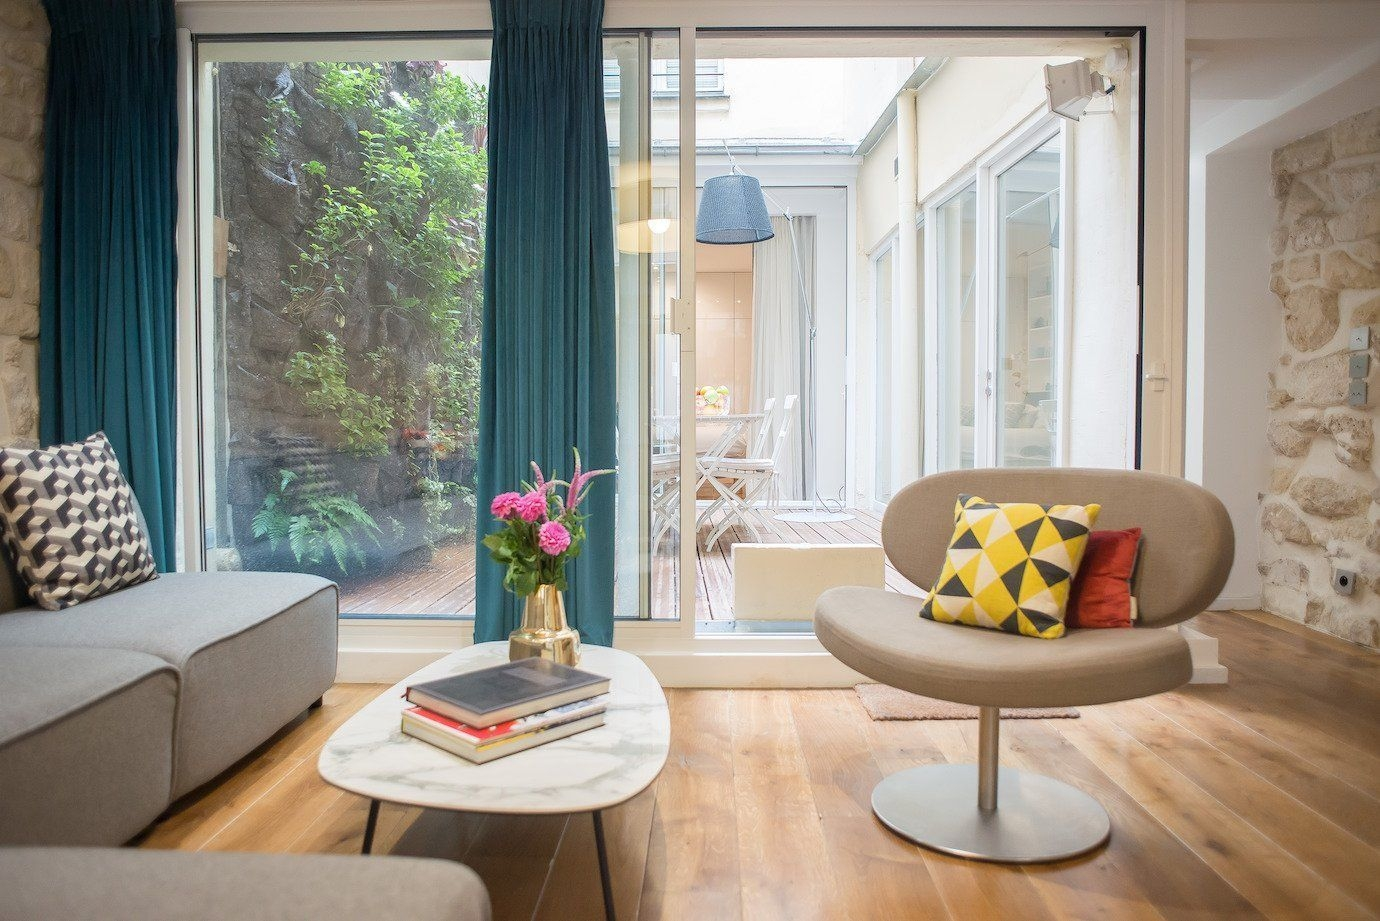 Astonishing Rental Apartment Decorating Ideas 09